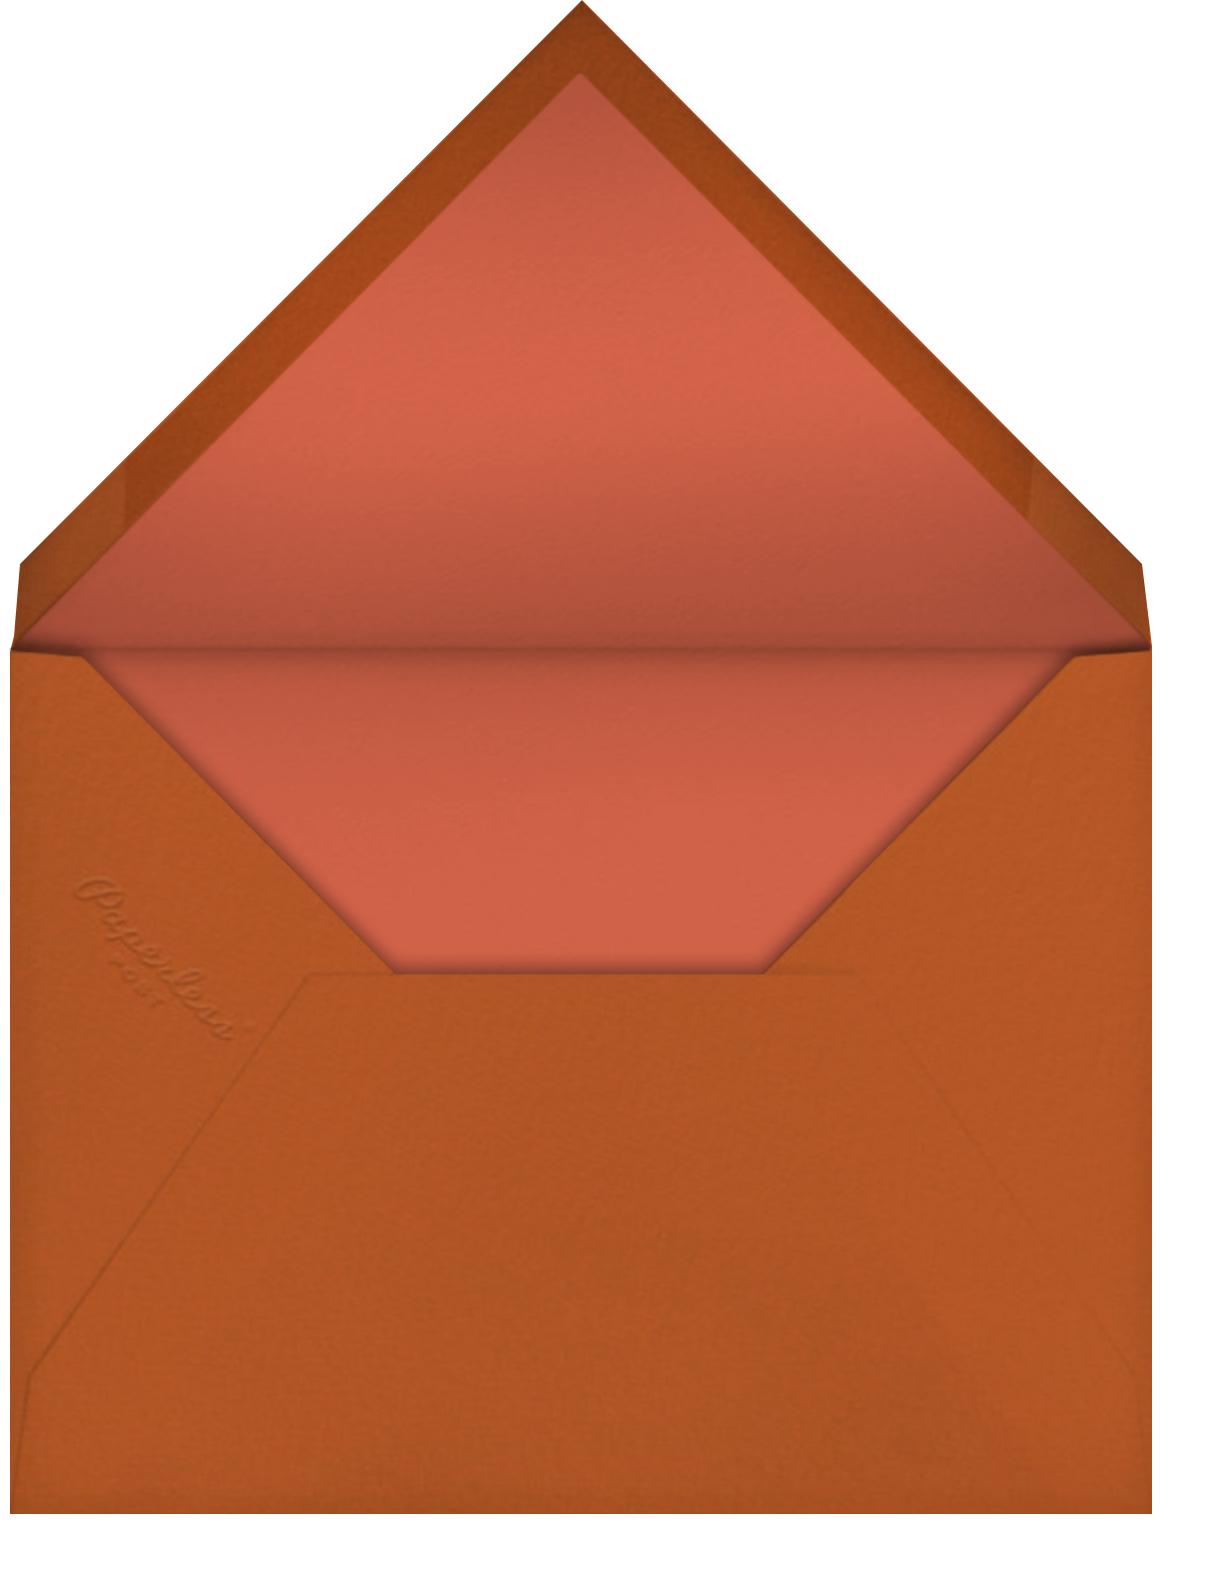 Maldives - Tarocco - Jonathan Adler - General entertaining - envelope back